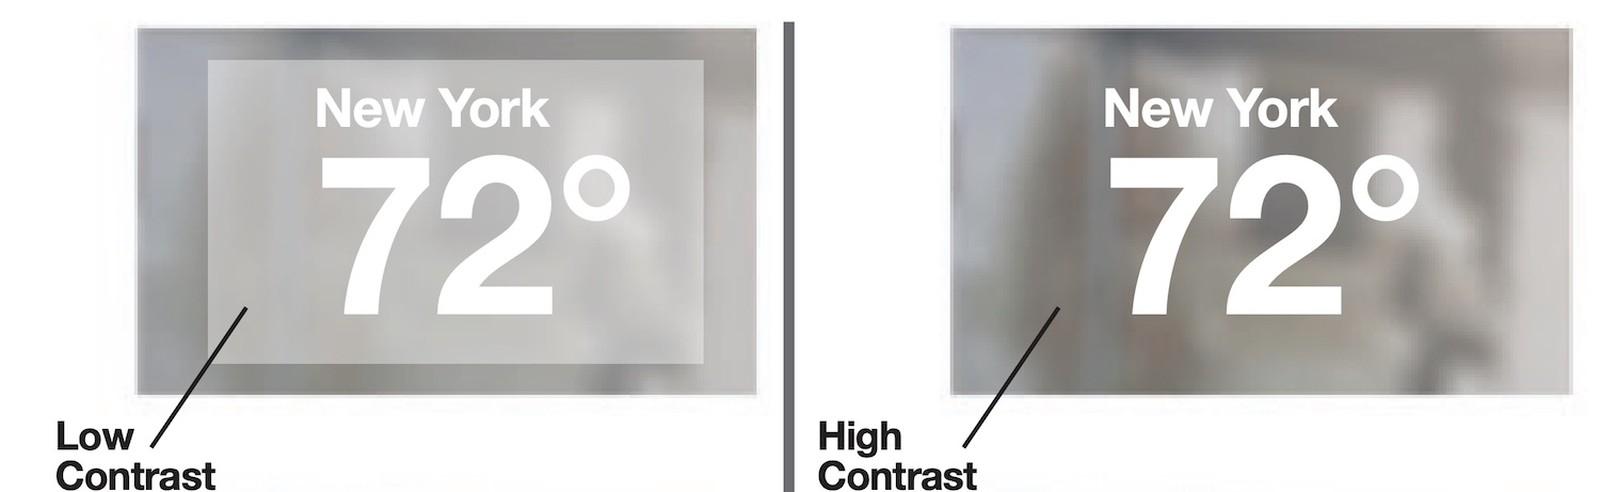 sony-high-contrast-apple-glasses-article.jpg